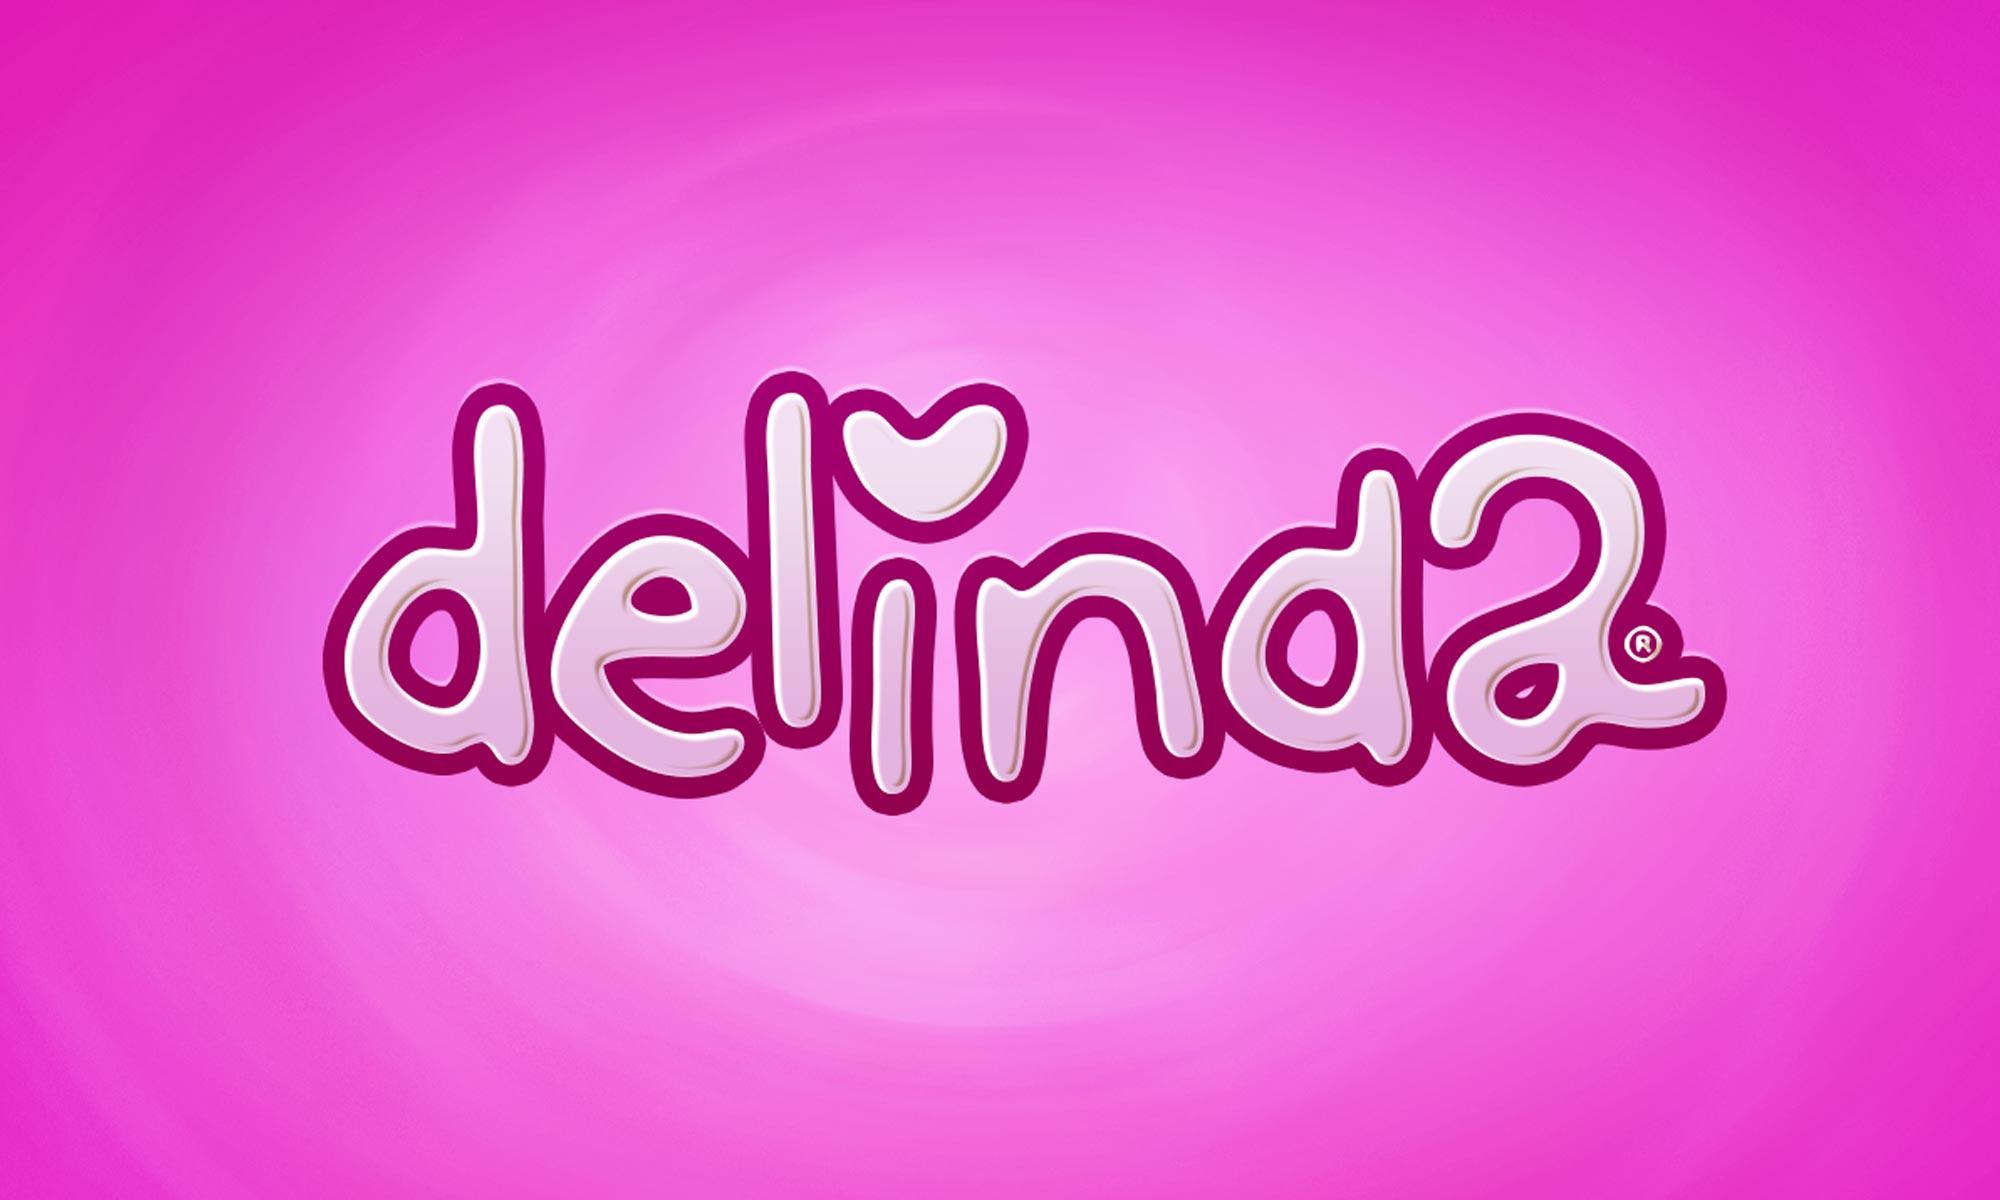 https://www.atelierzoz.com/wp-content/uploads/2020/03/works_delinda-1.jpg